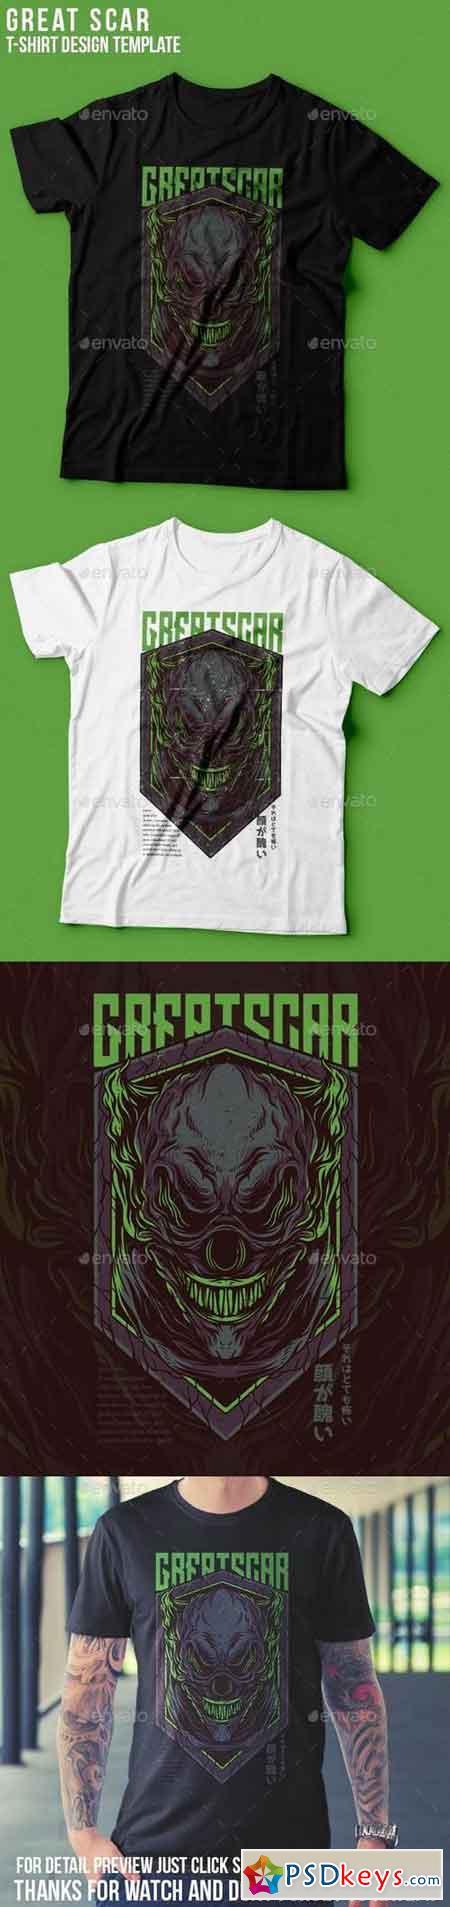 Great Scar T-Shirt Design 22939359